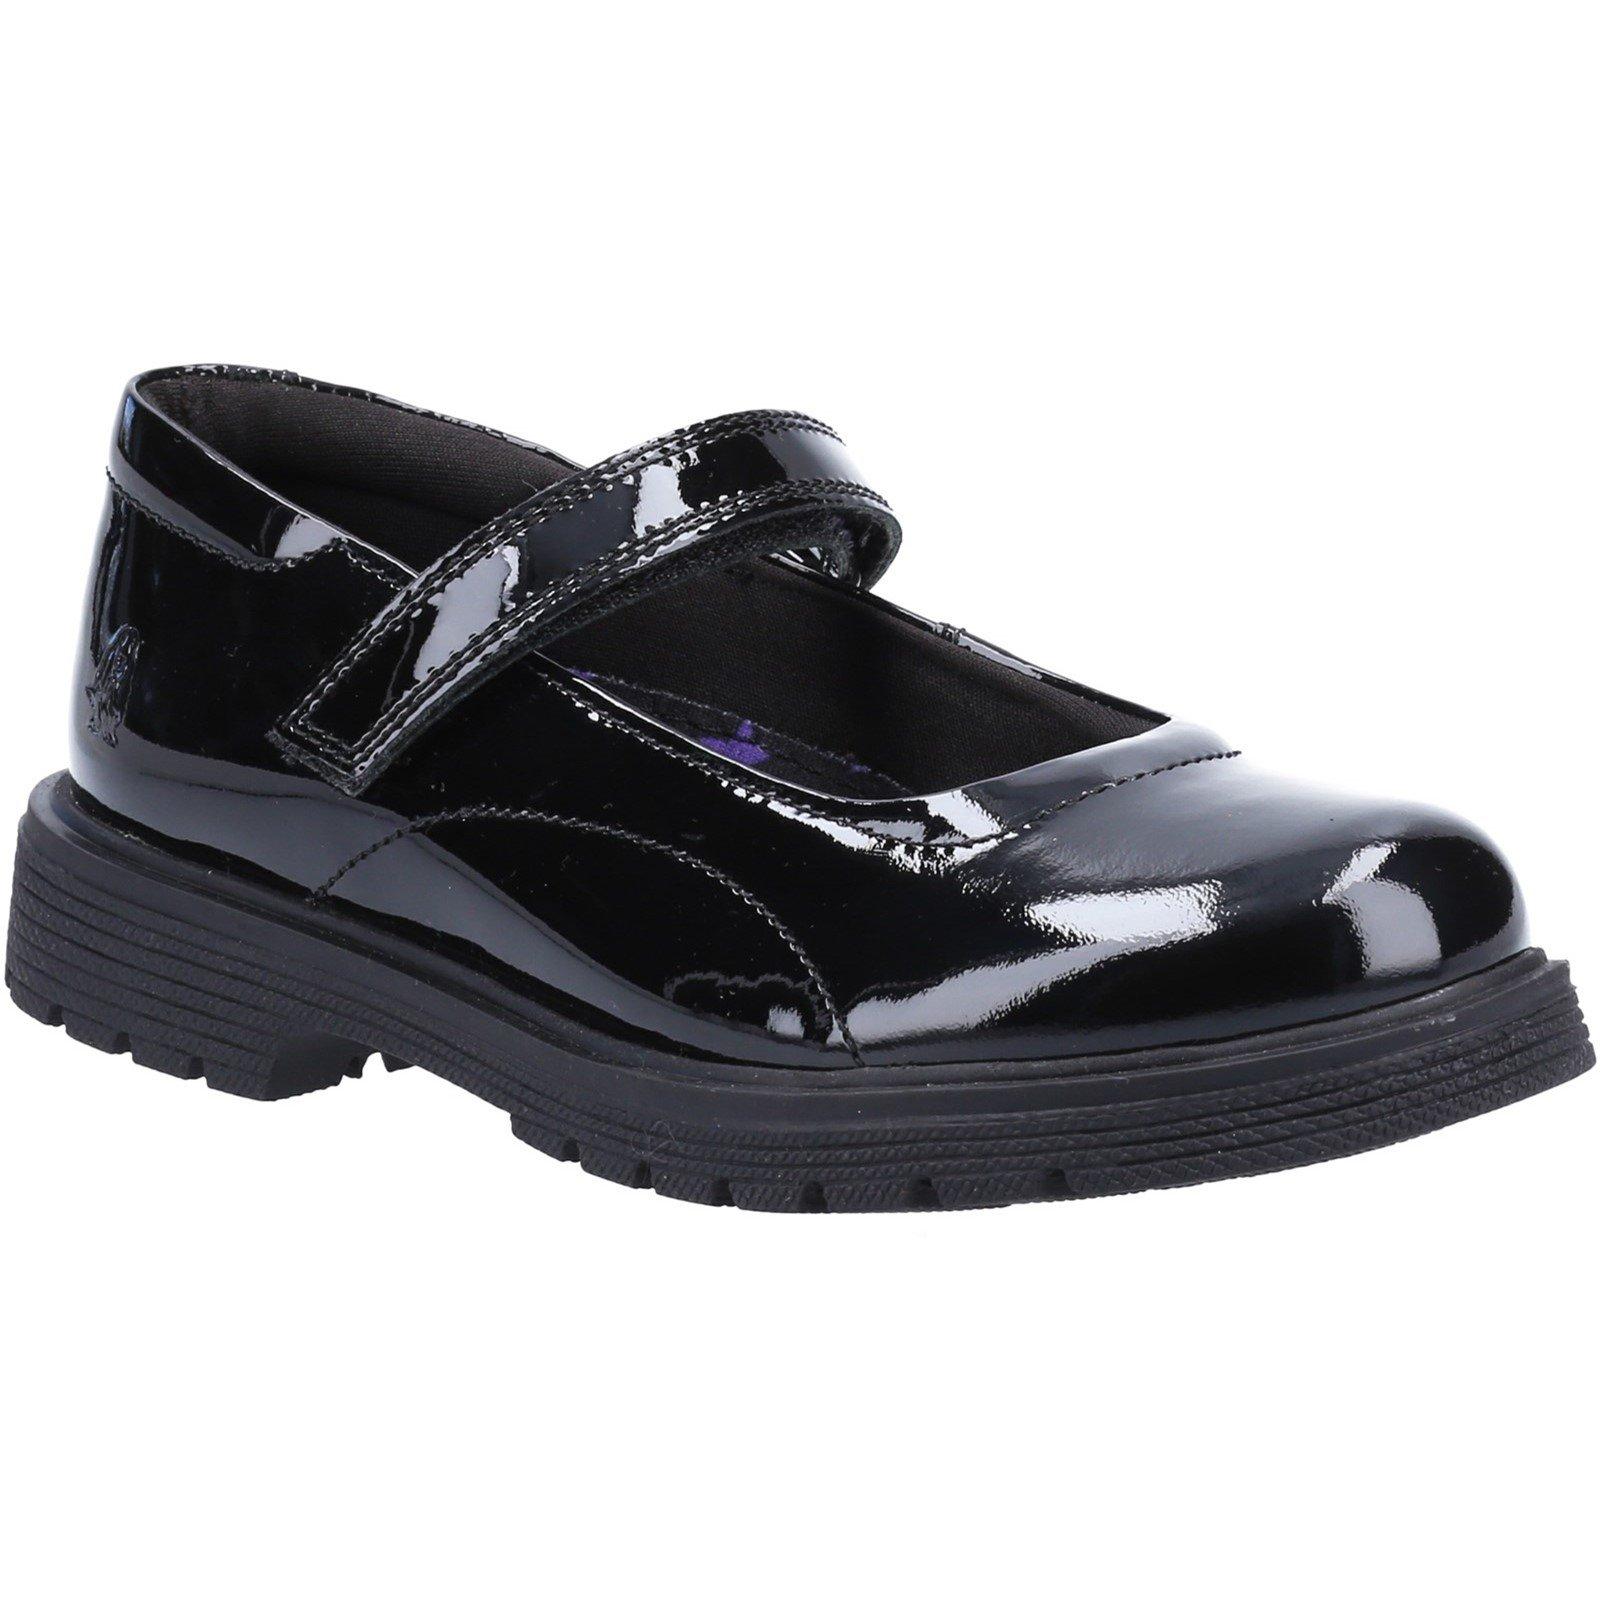 Hush Puppies Kid's Tally Junior School Shoe Patent Black 32814 - Patent Black 2